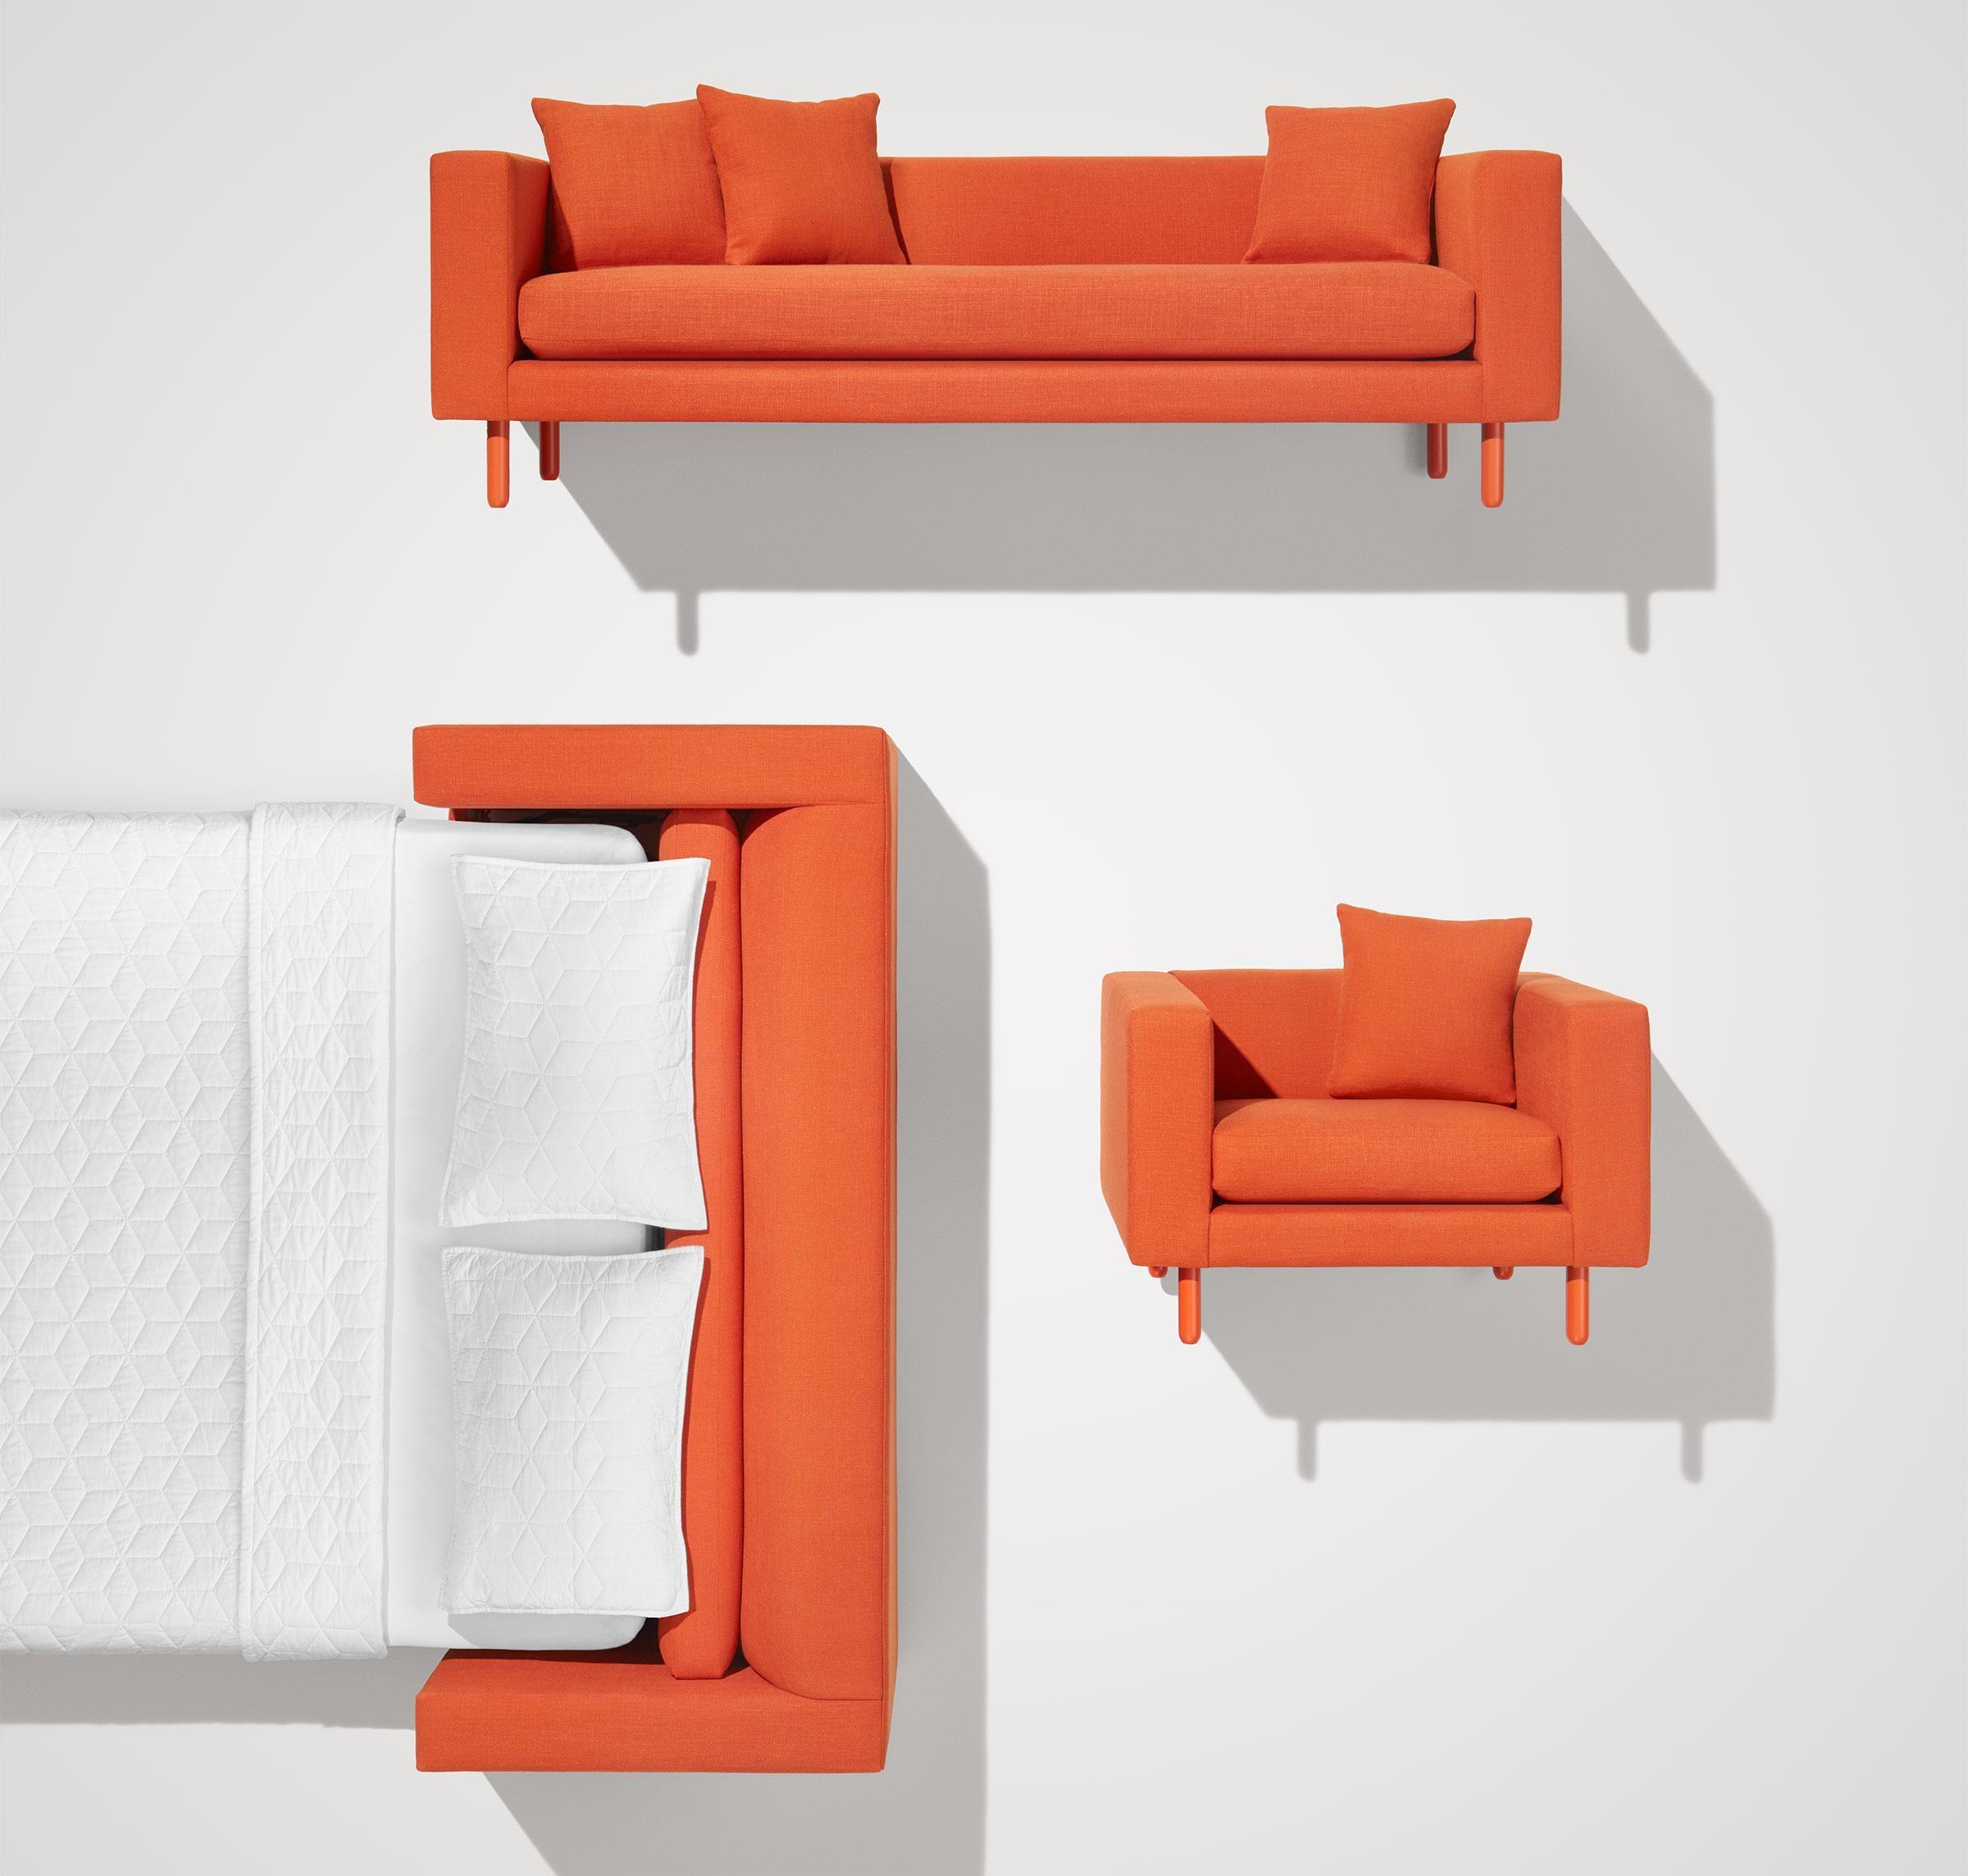 Mono Modern Sleeper Sofa – Single Cushion Sofa | Blu Dot In Blu Dot Sleeper Sofas (Image 6 of 20)